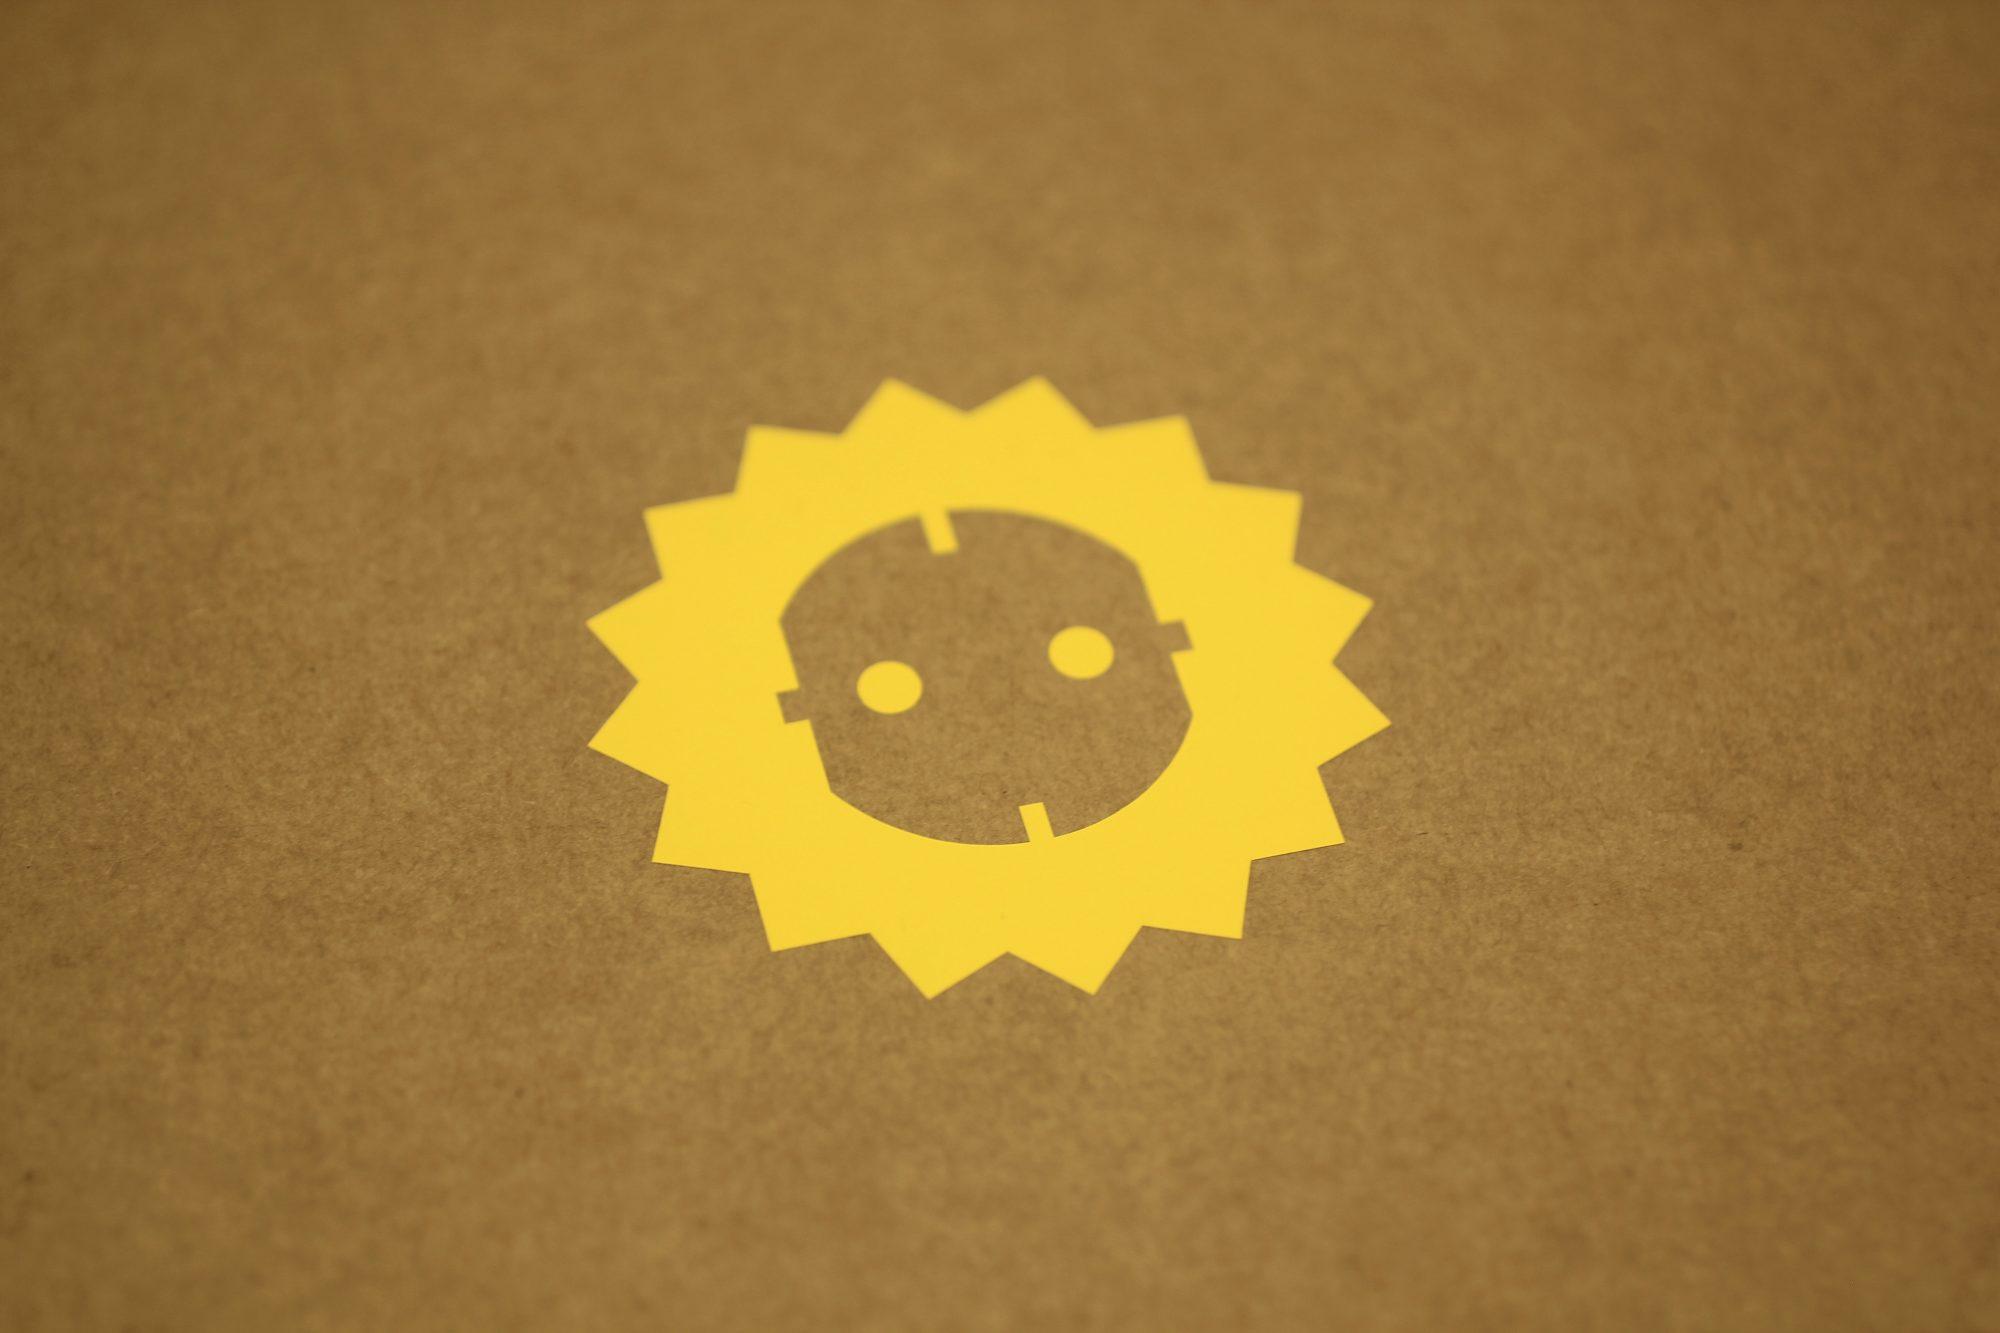 01 ZonnefabriekBOX_byTOMM